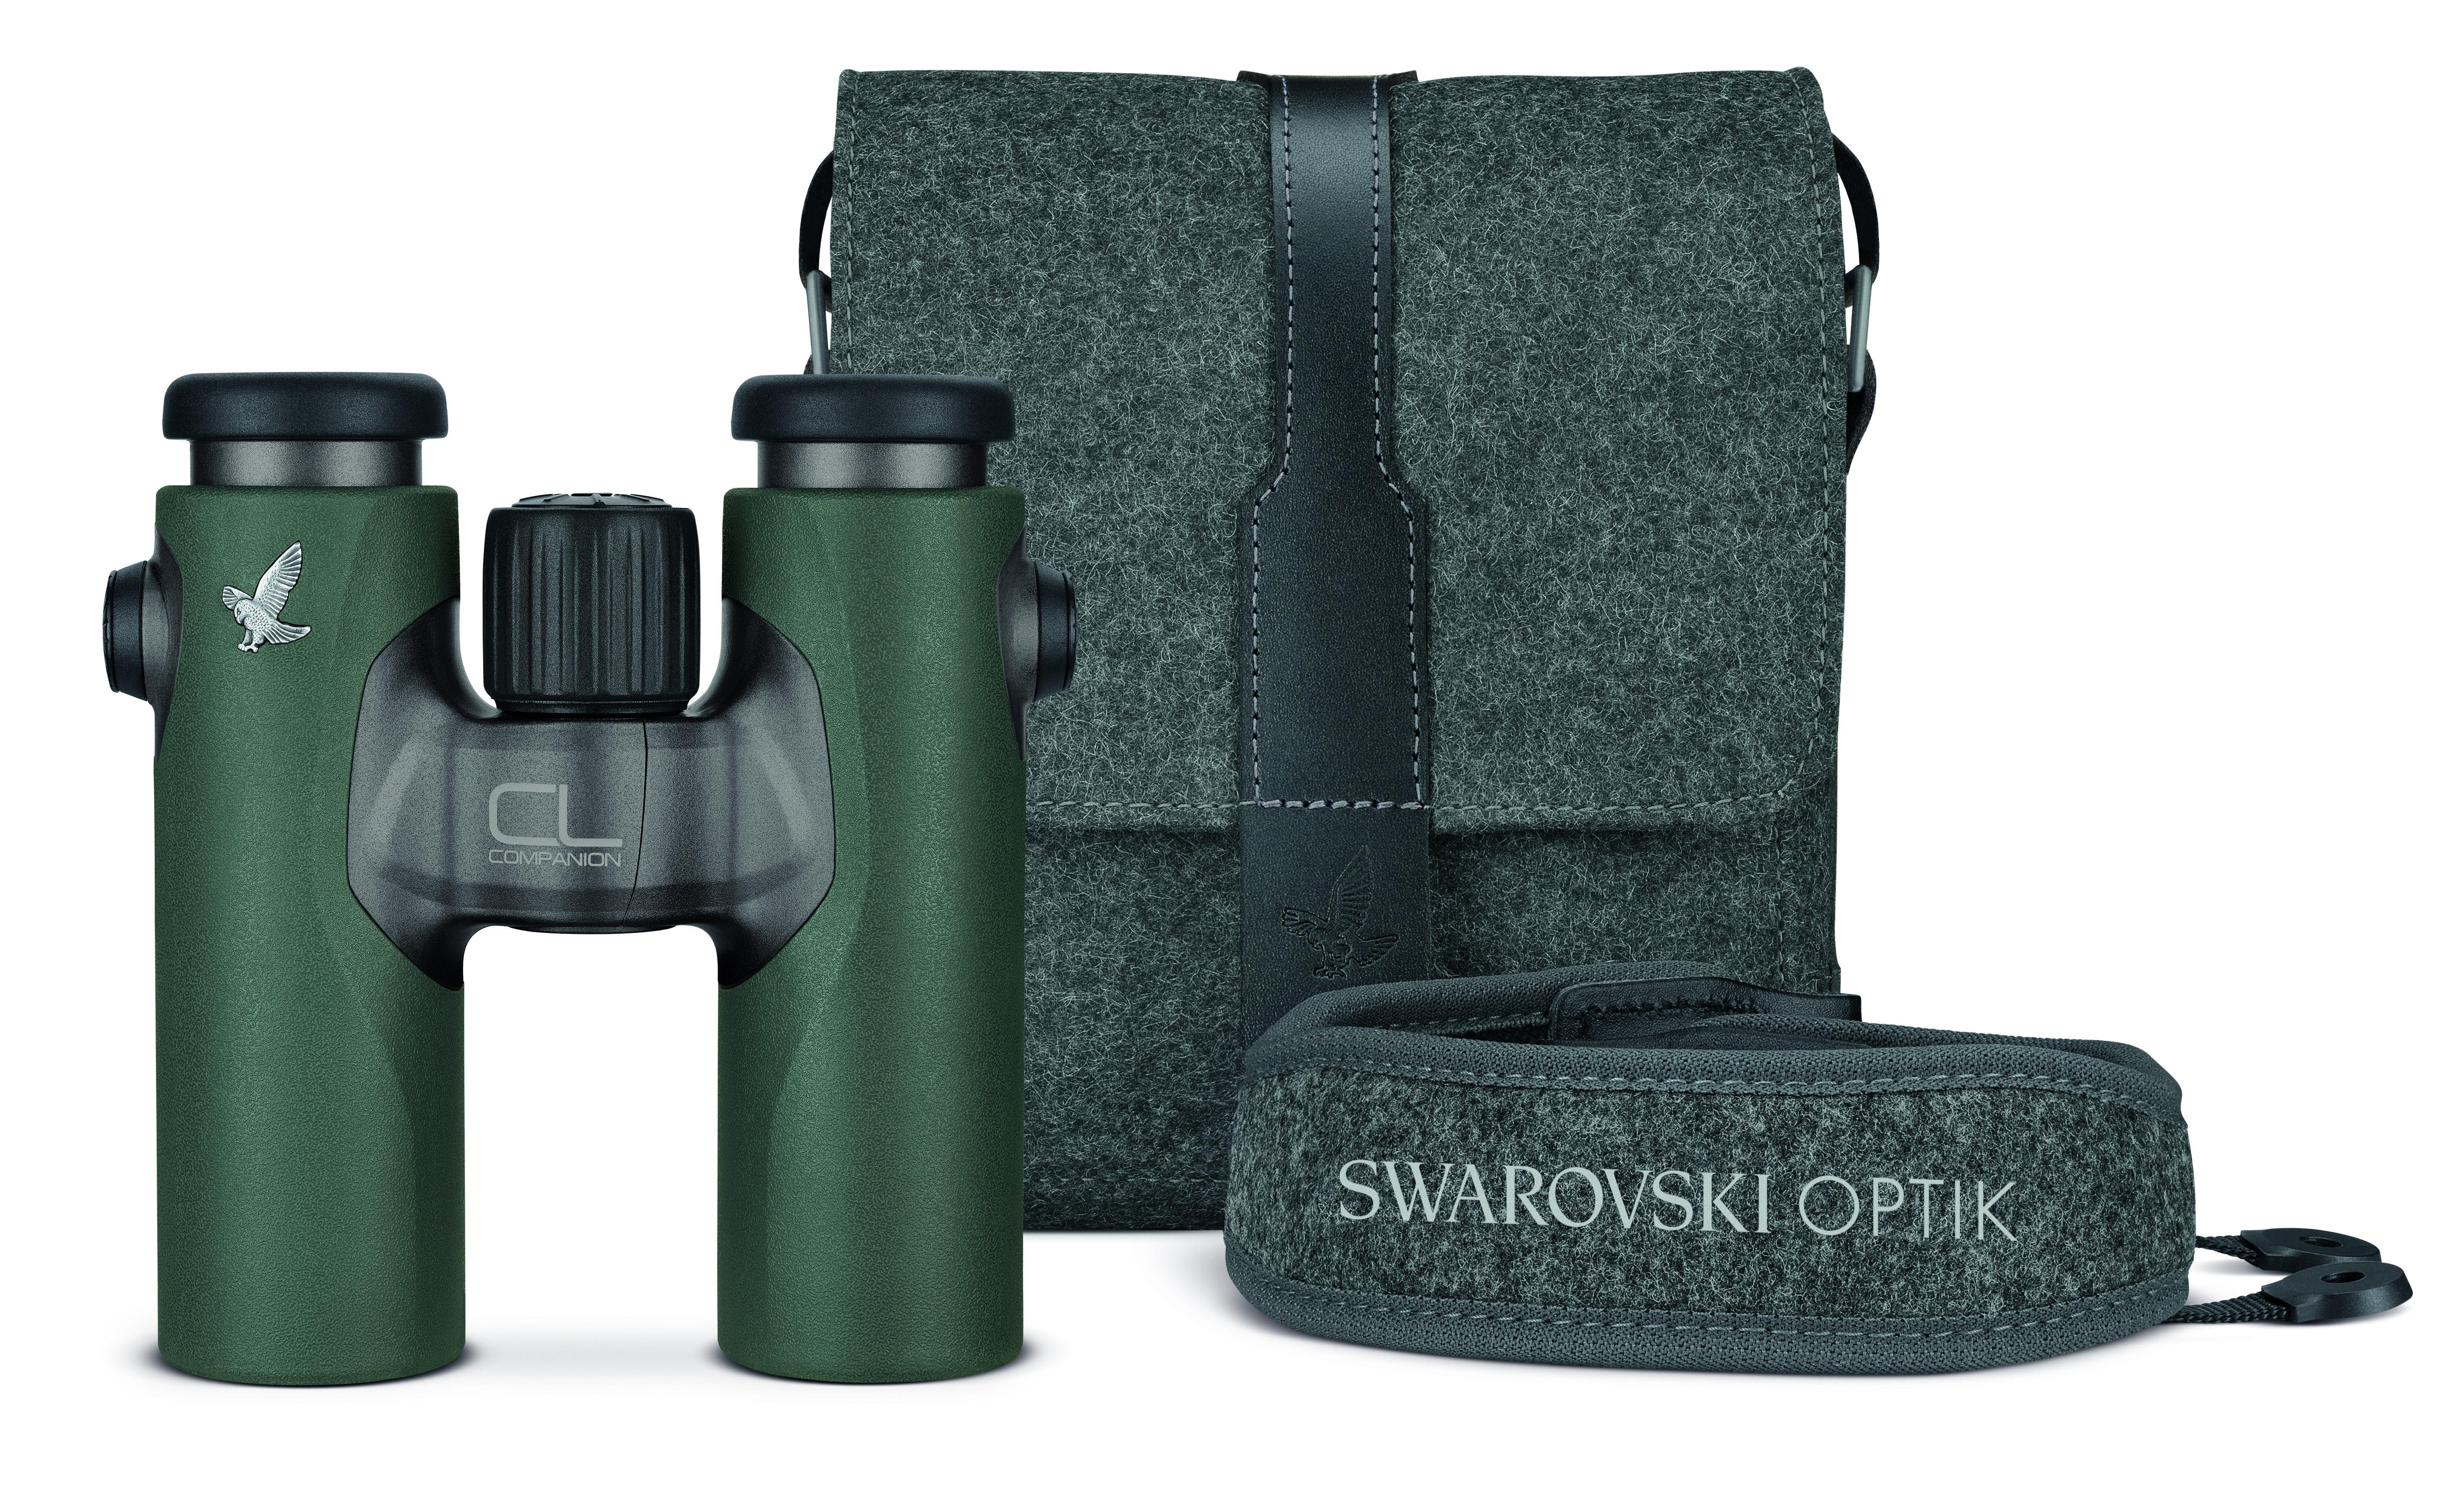 Swarovski CL Companion 10x30 B Green - Northern Lights